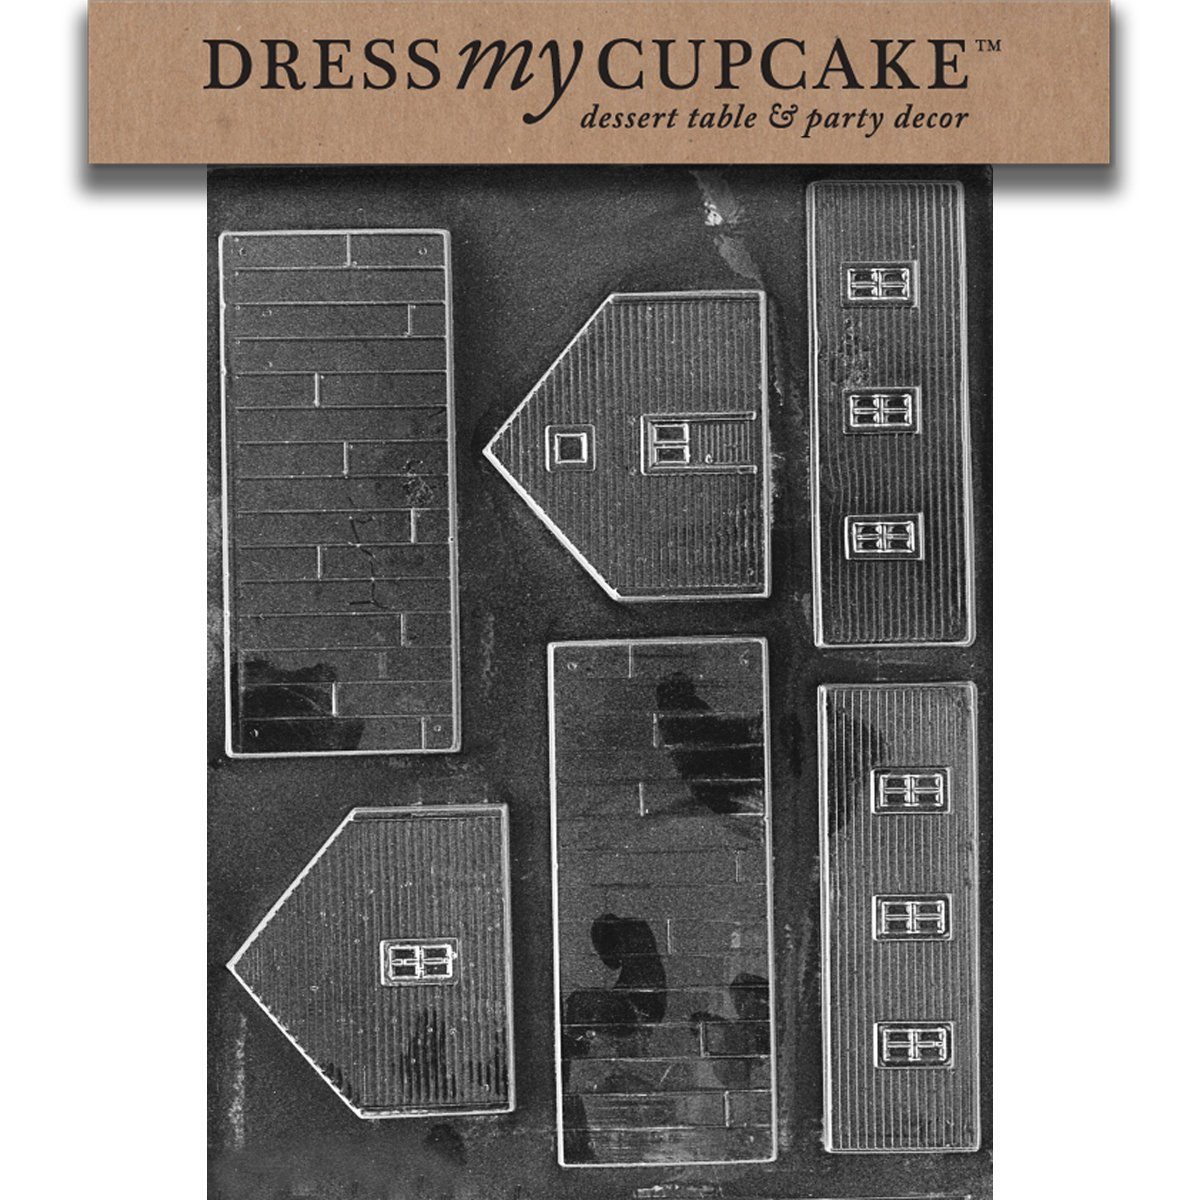 Dress My Cupcake DMCM056SET Chocolate Candy Mold, School, Set of 6